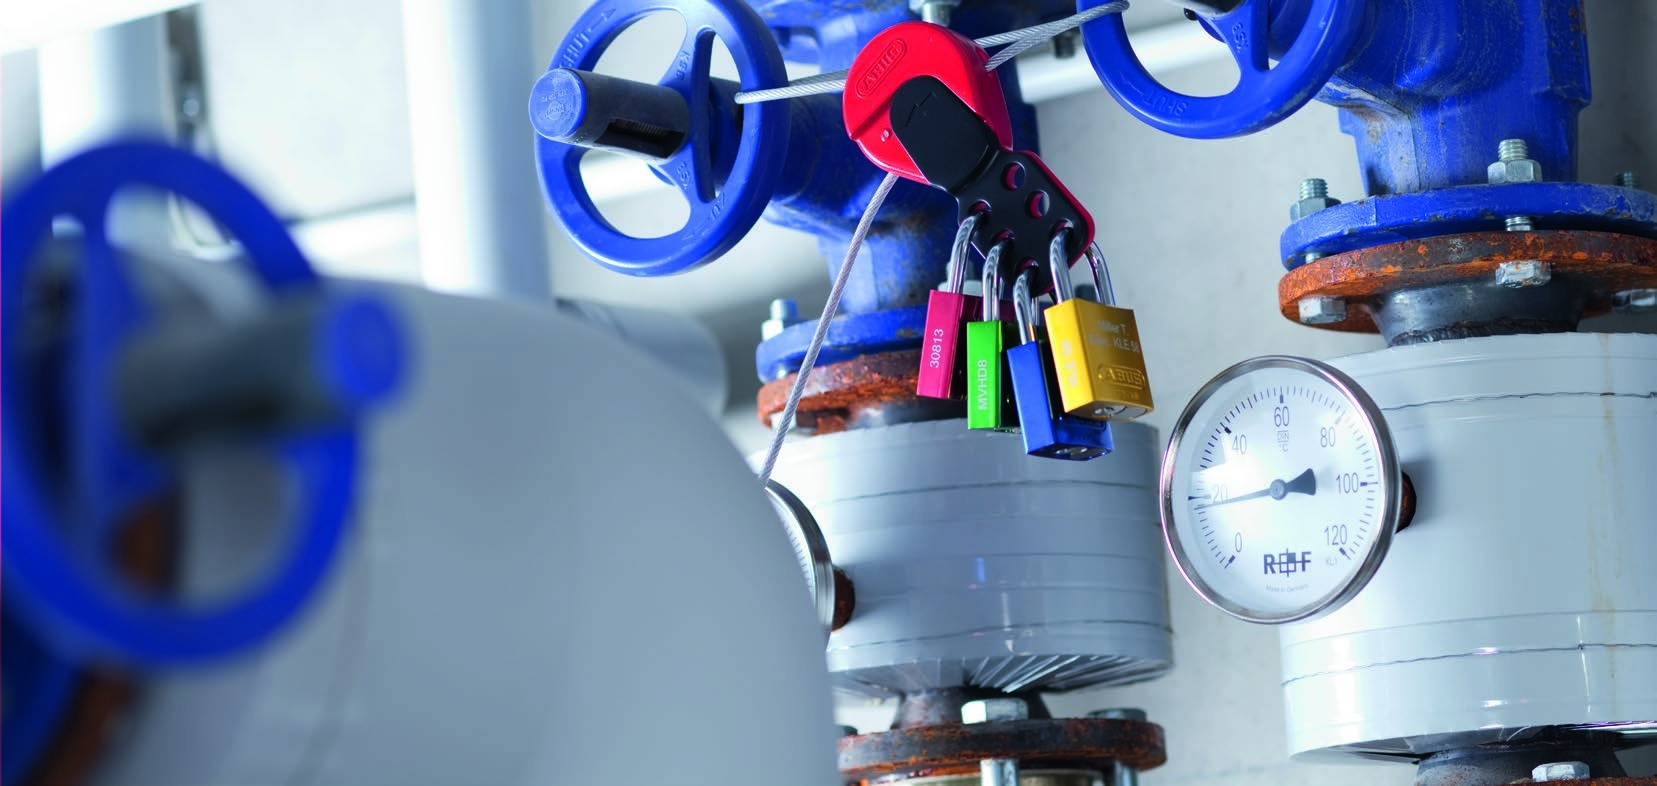 Aspas De Control Con Cable Universal Para 6 Candados